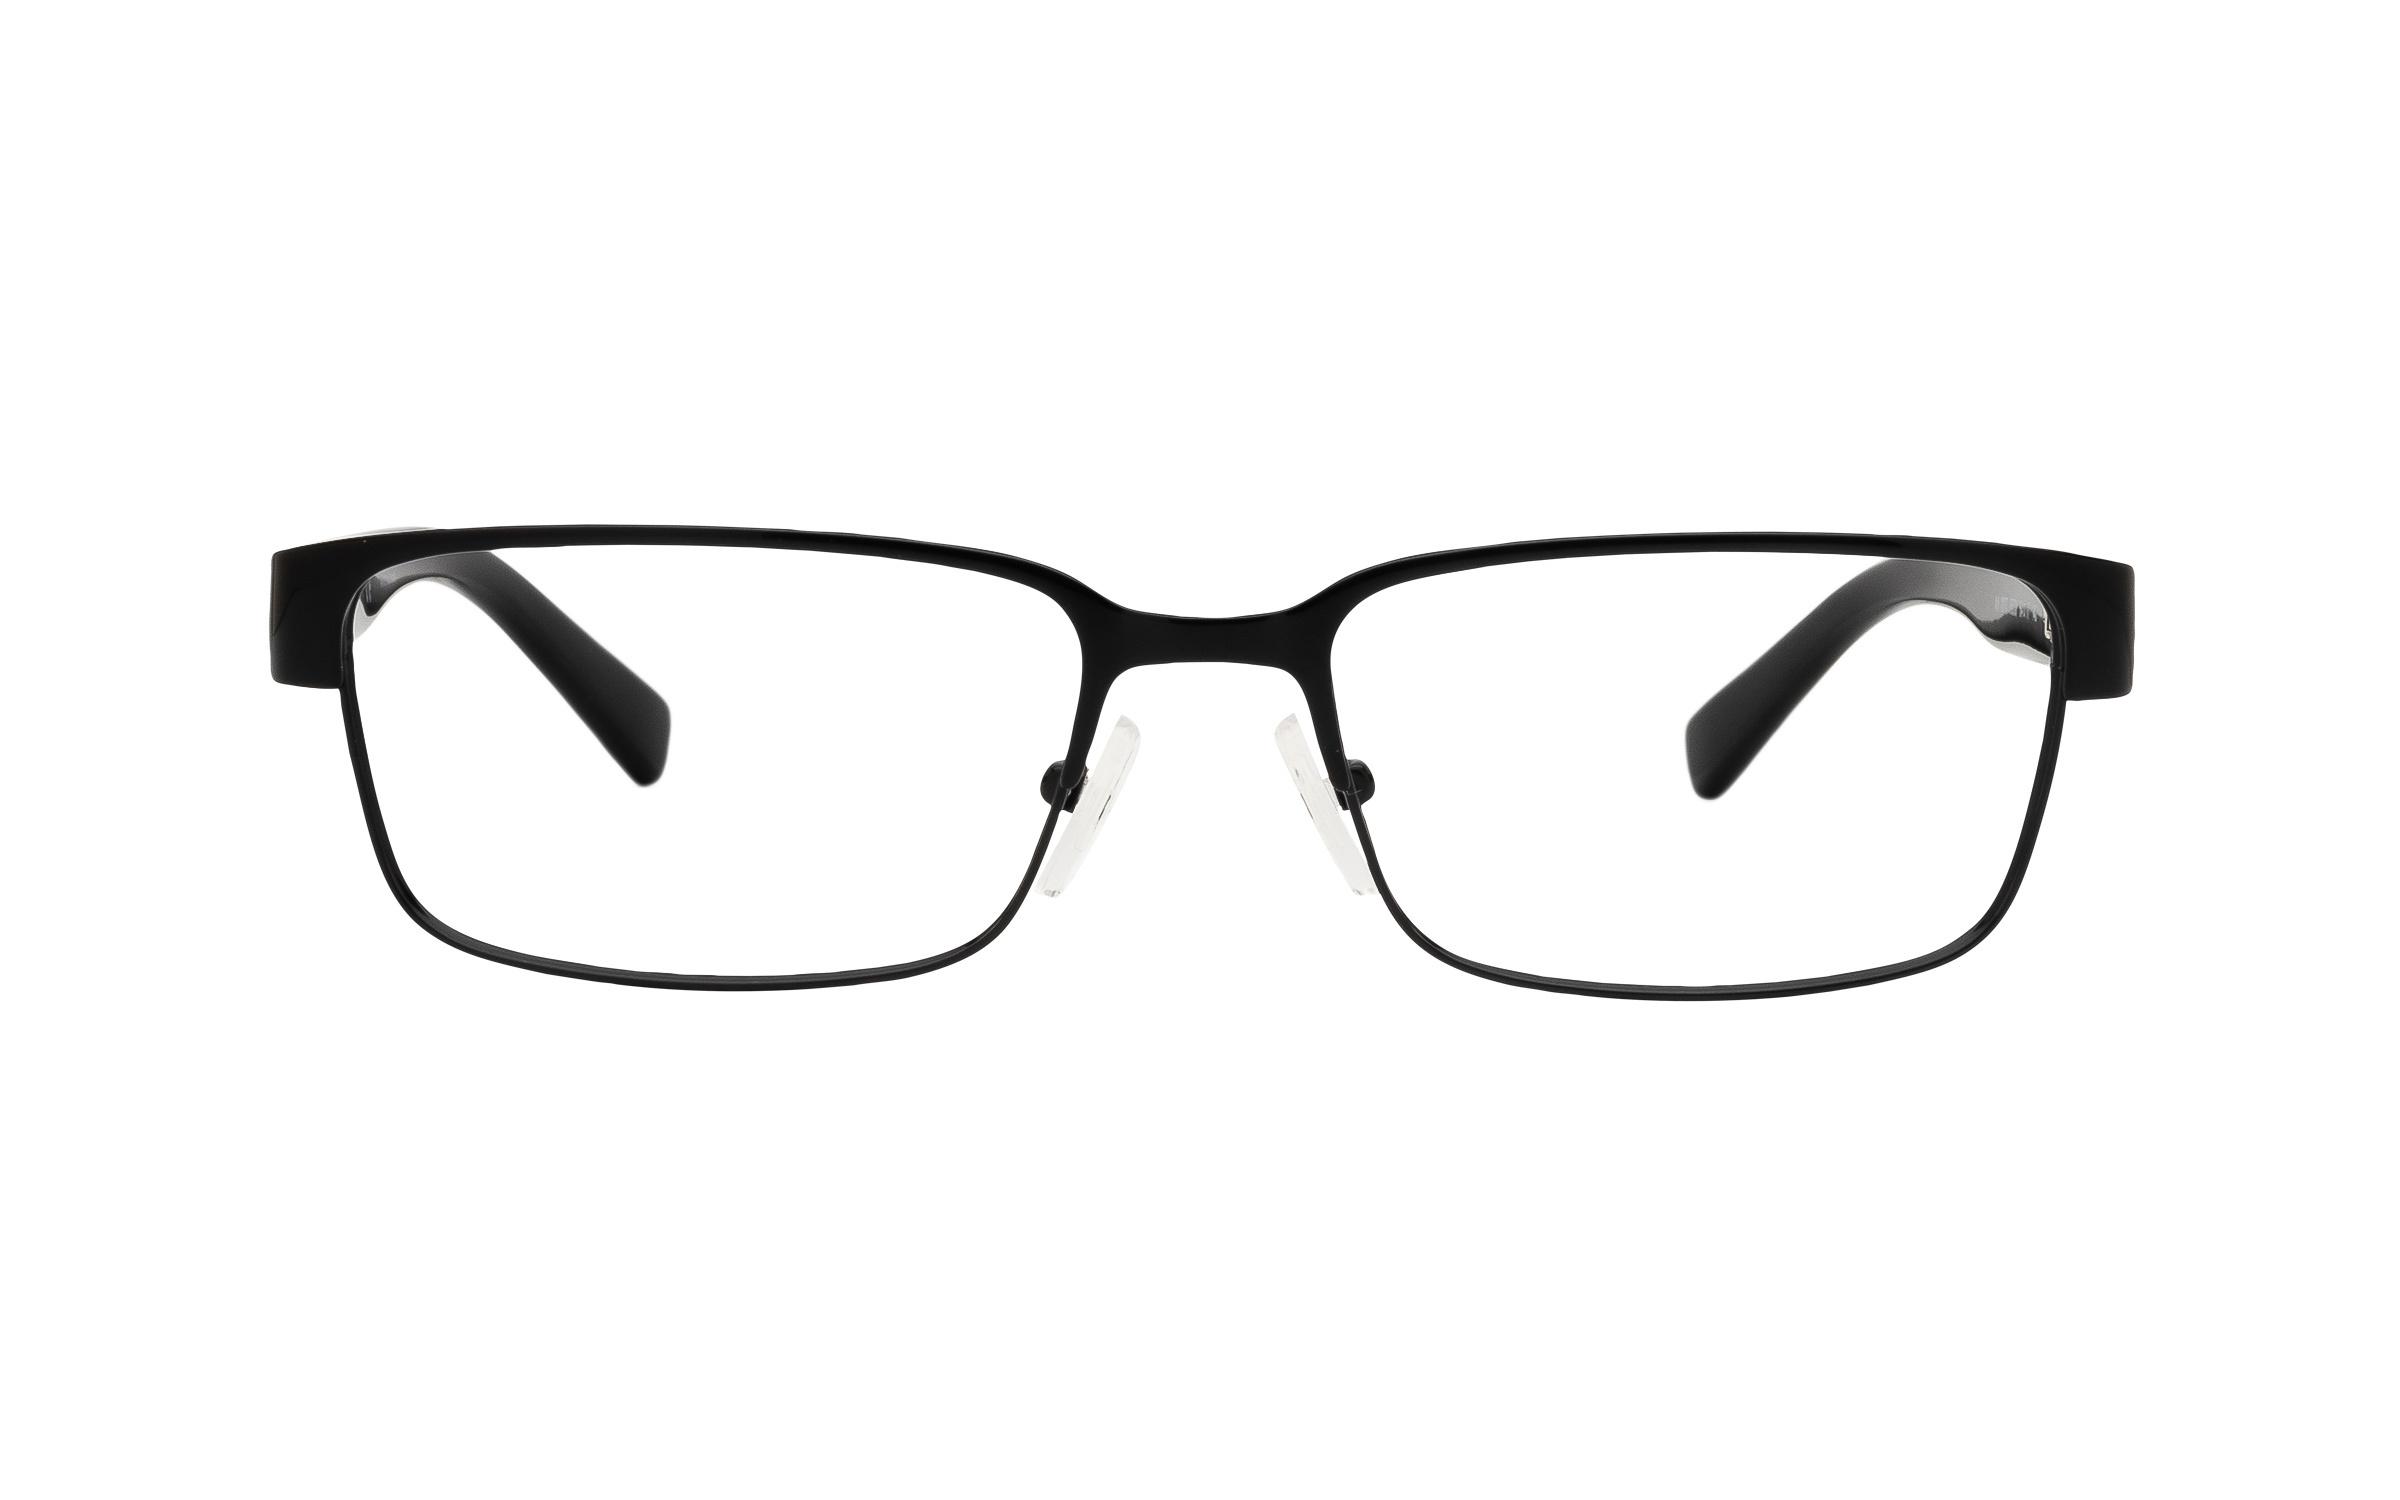 Armani Exchange AX1017 6000 (54) Eyeglasses and Frame in Shiny Black | Acetate - Online Coastal